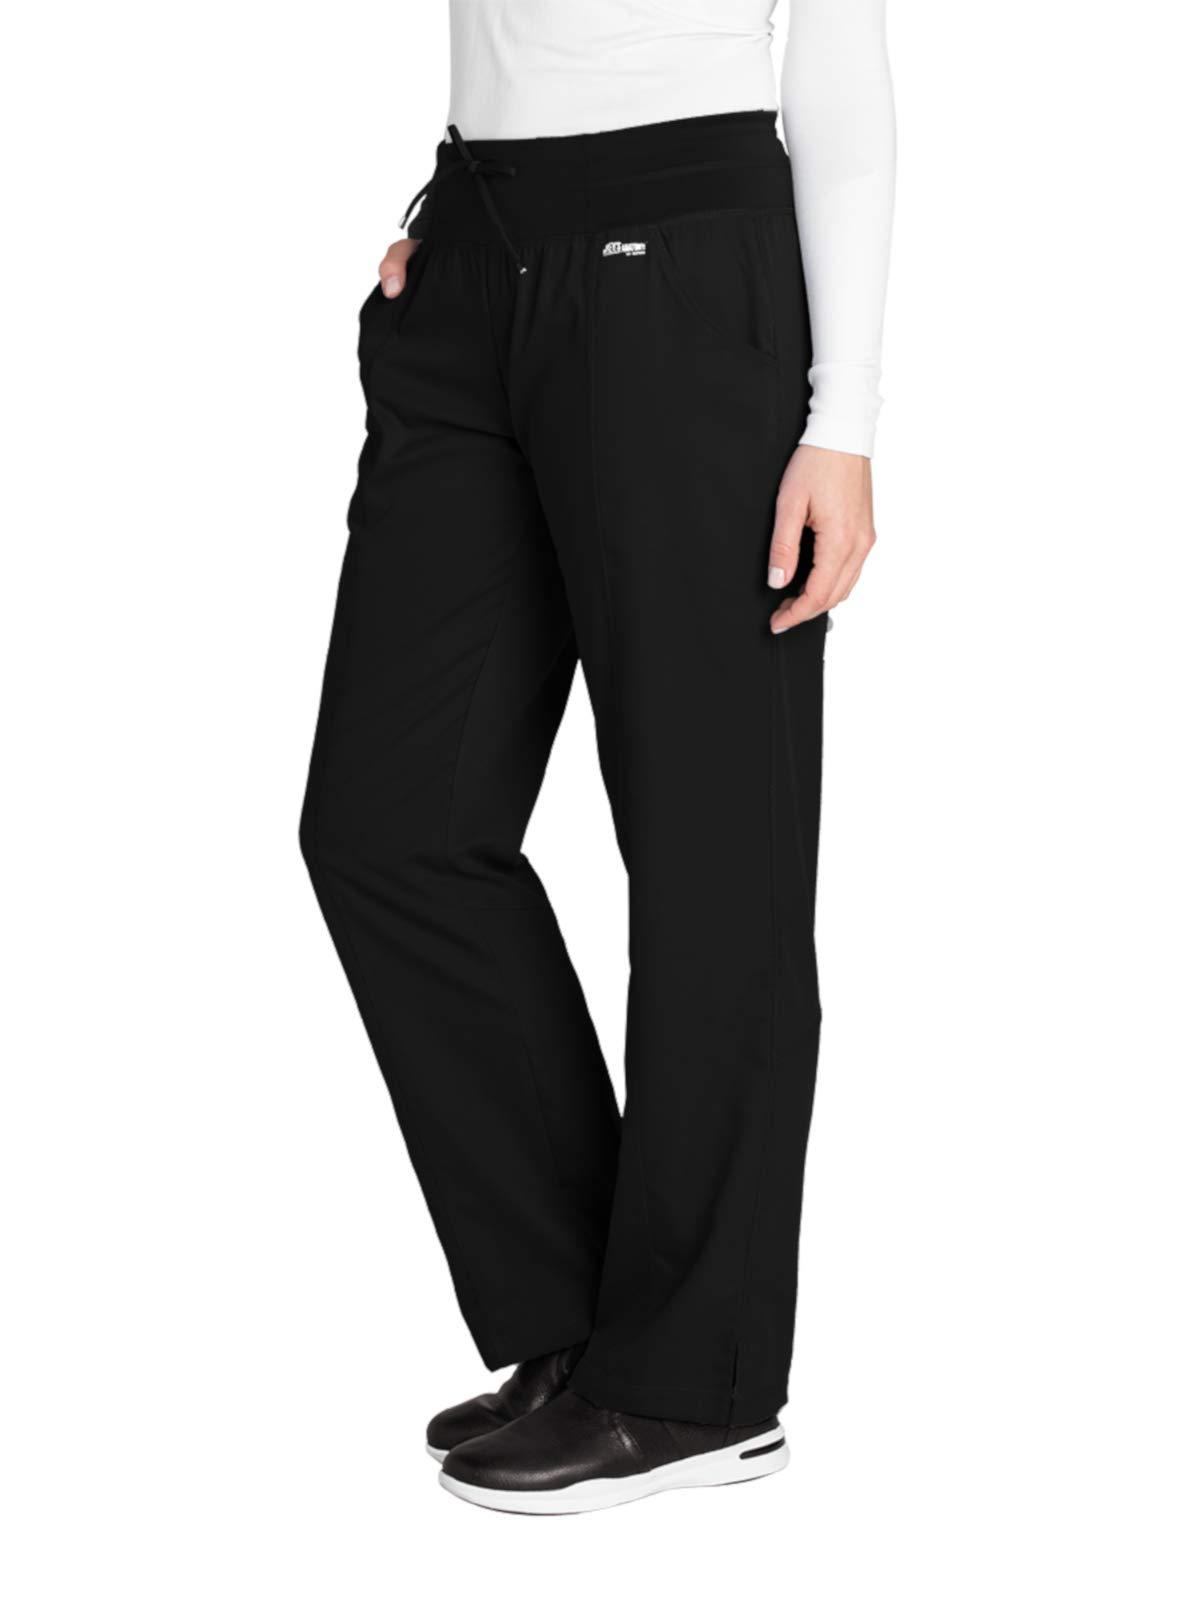 Grey's Anatomy Active 4276 Yoga Pant Black 2XL Petite